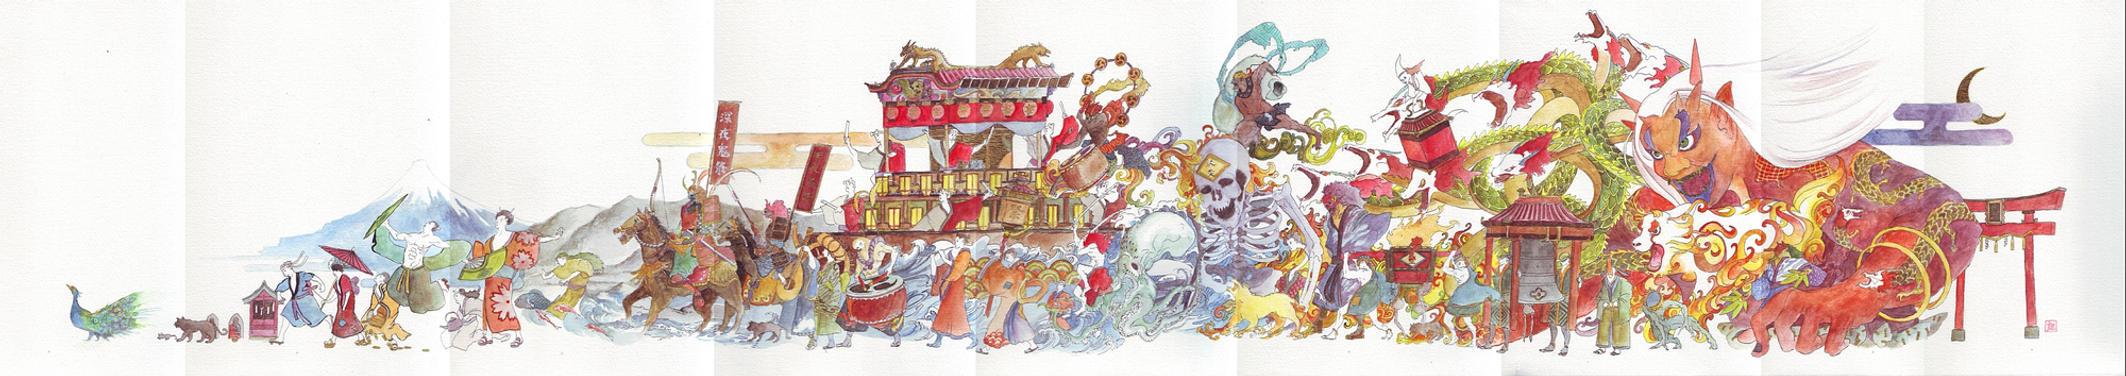 Demon Carnival by niuner